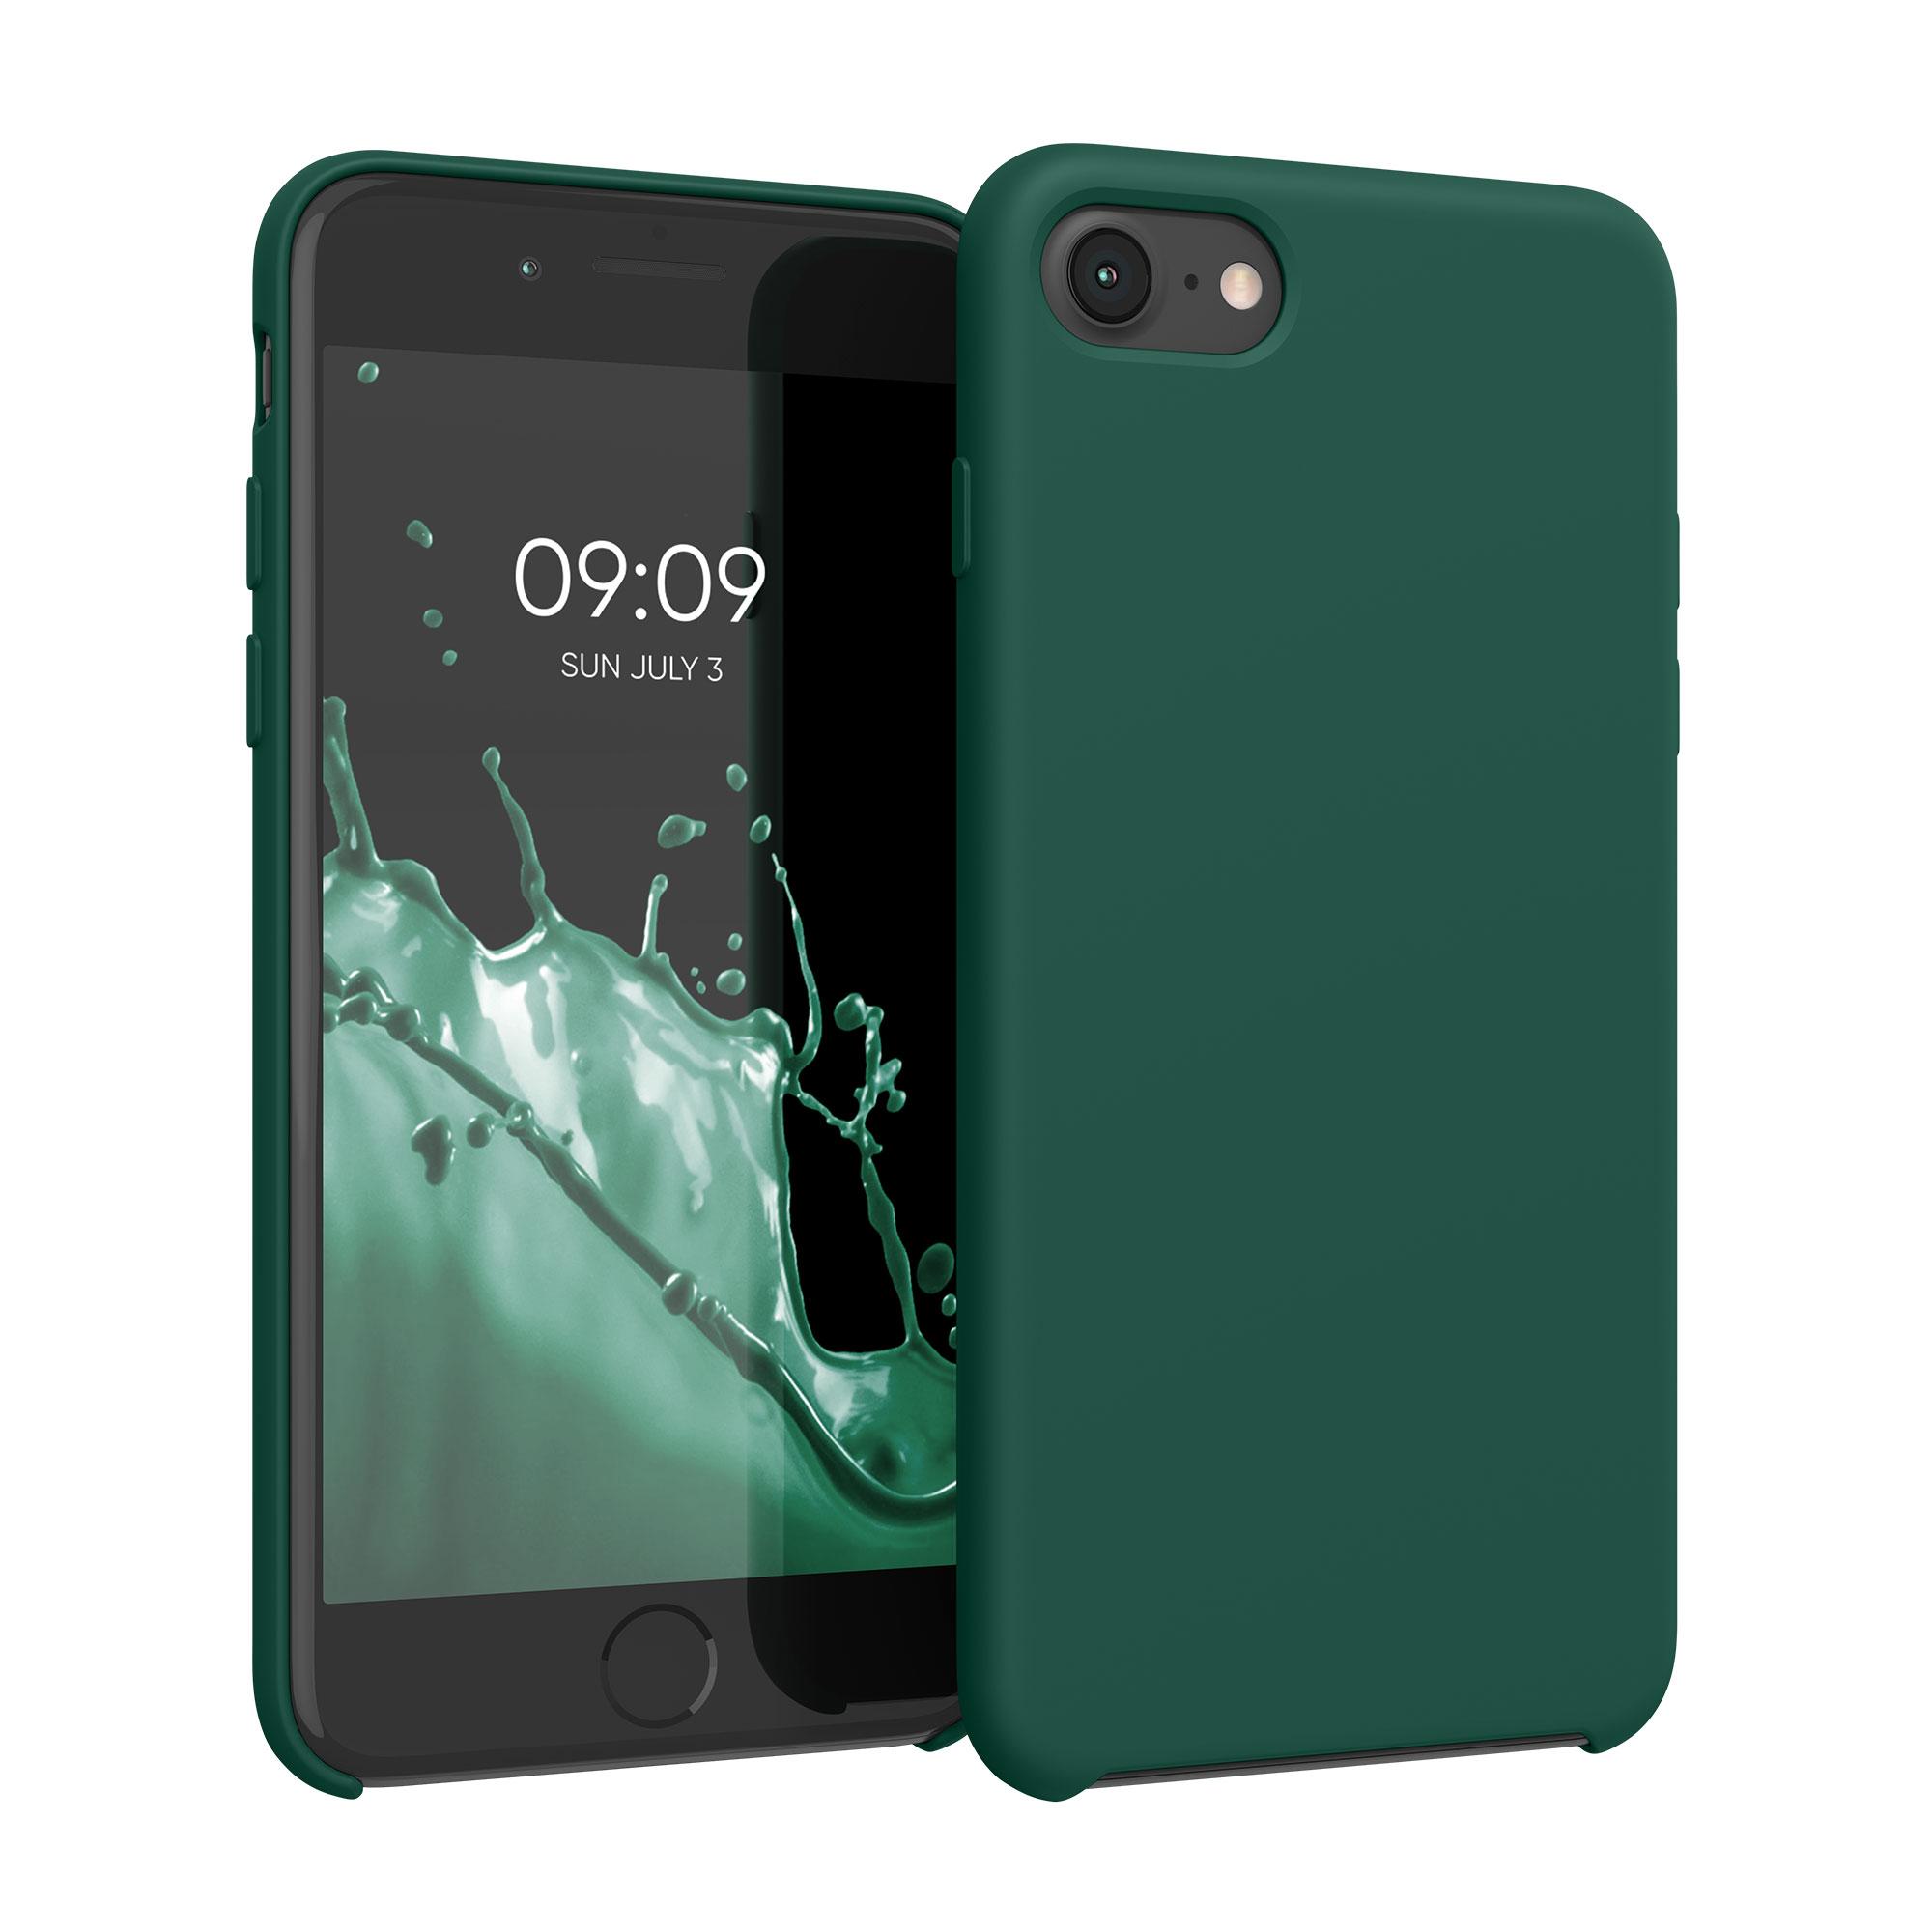 Kvalitní silikonové TPU pouzdro pro Apple iPhone 7 / 8 / SE  - Turquoise Green